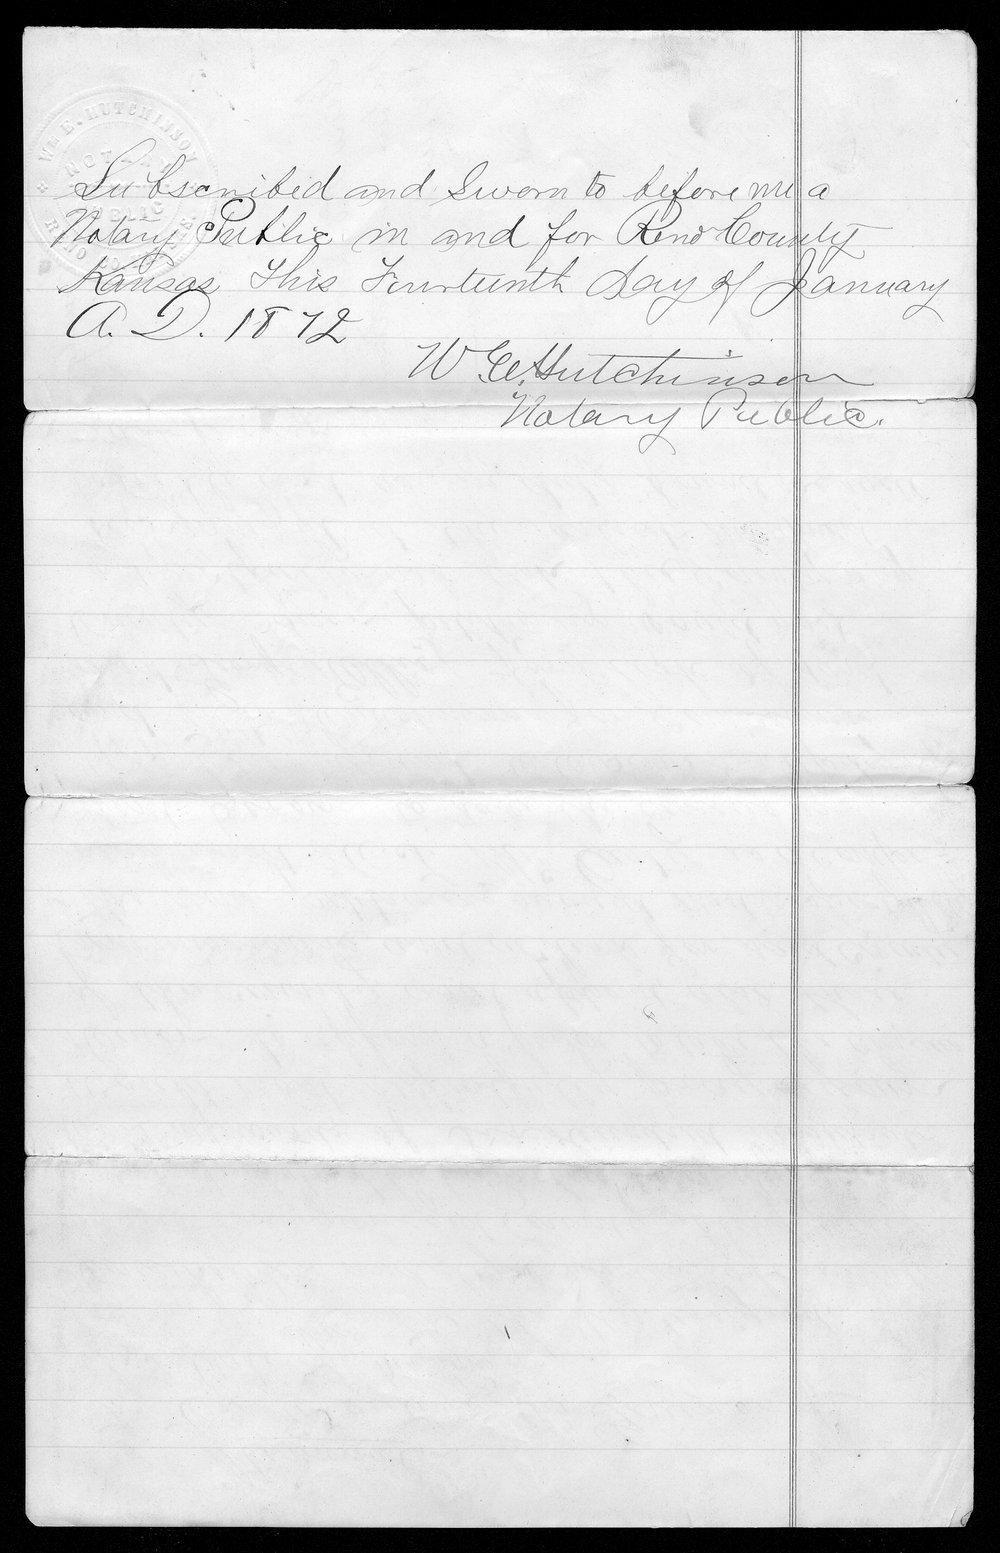 Barber county organization records - 4